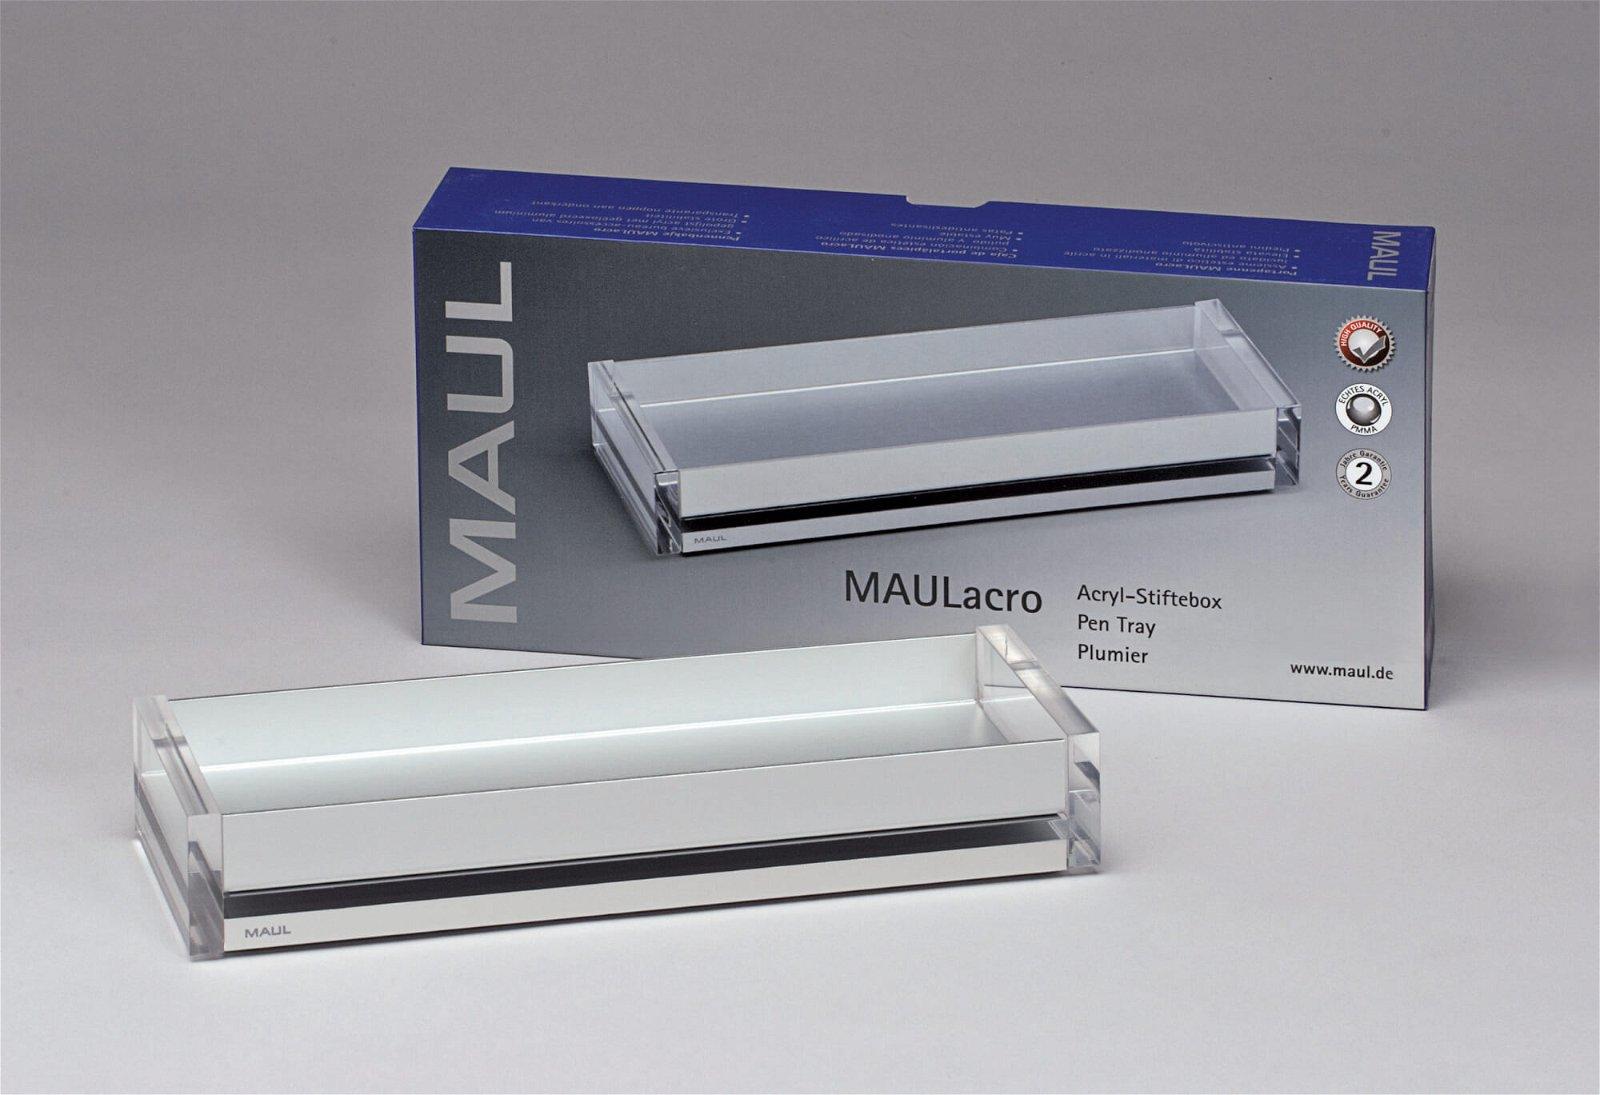 Acryl-Stifteschale MAULacro, glasklar